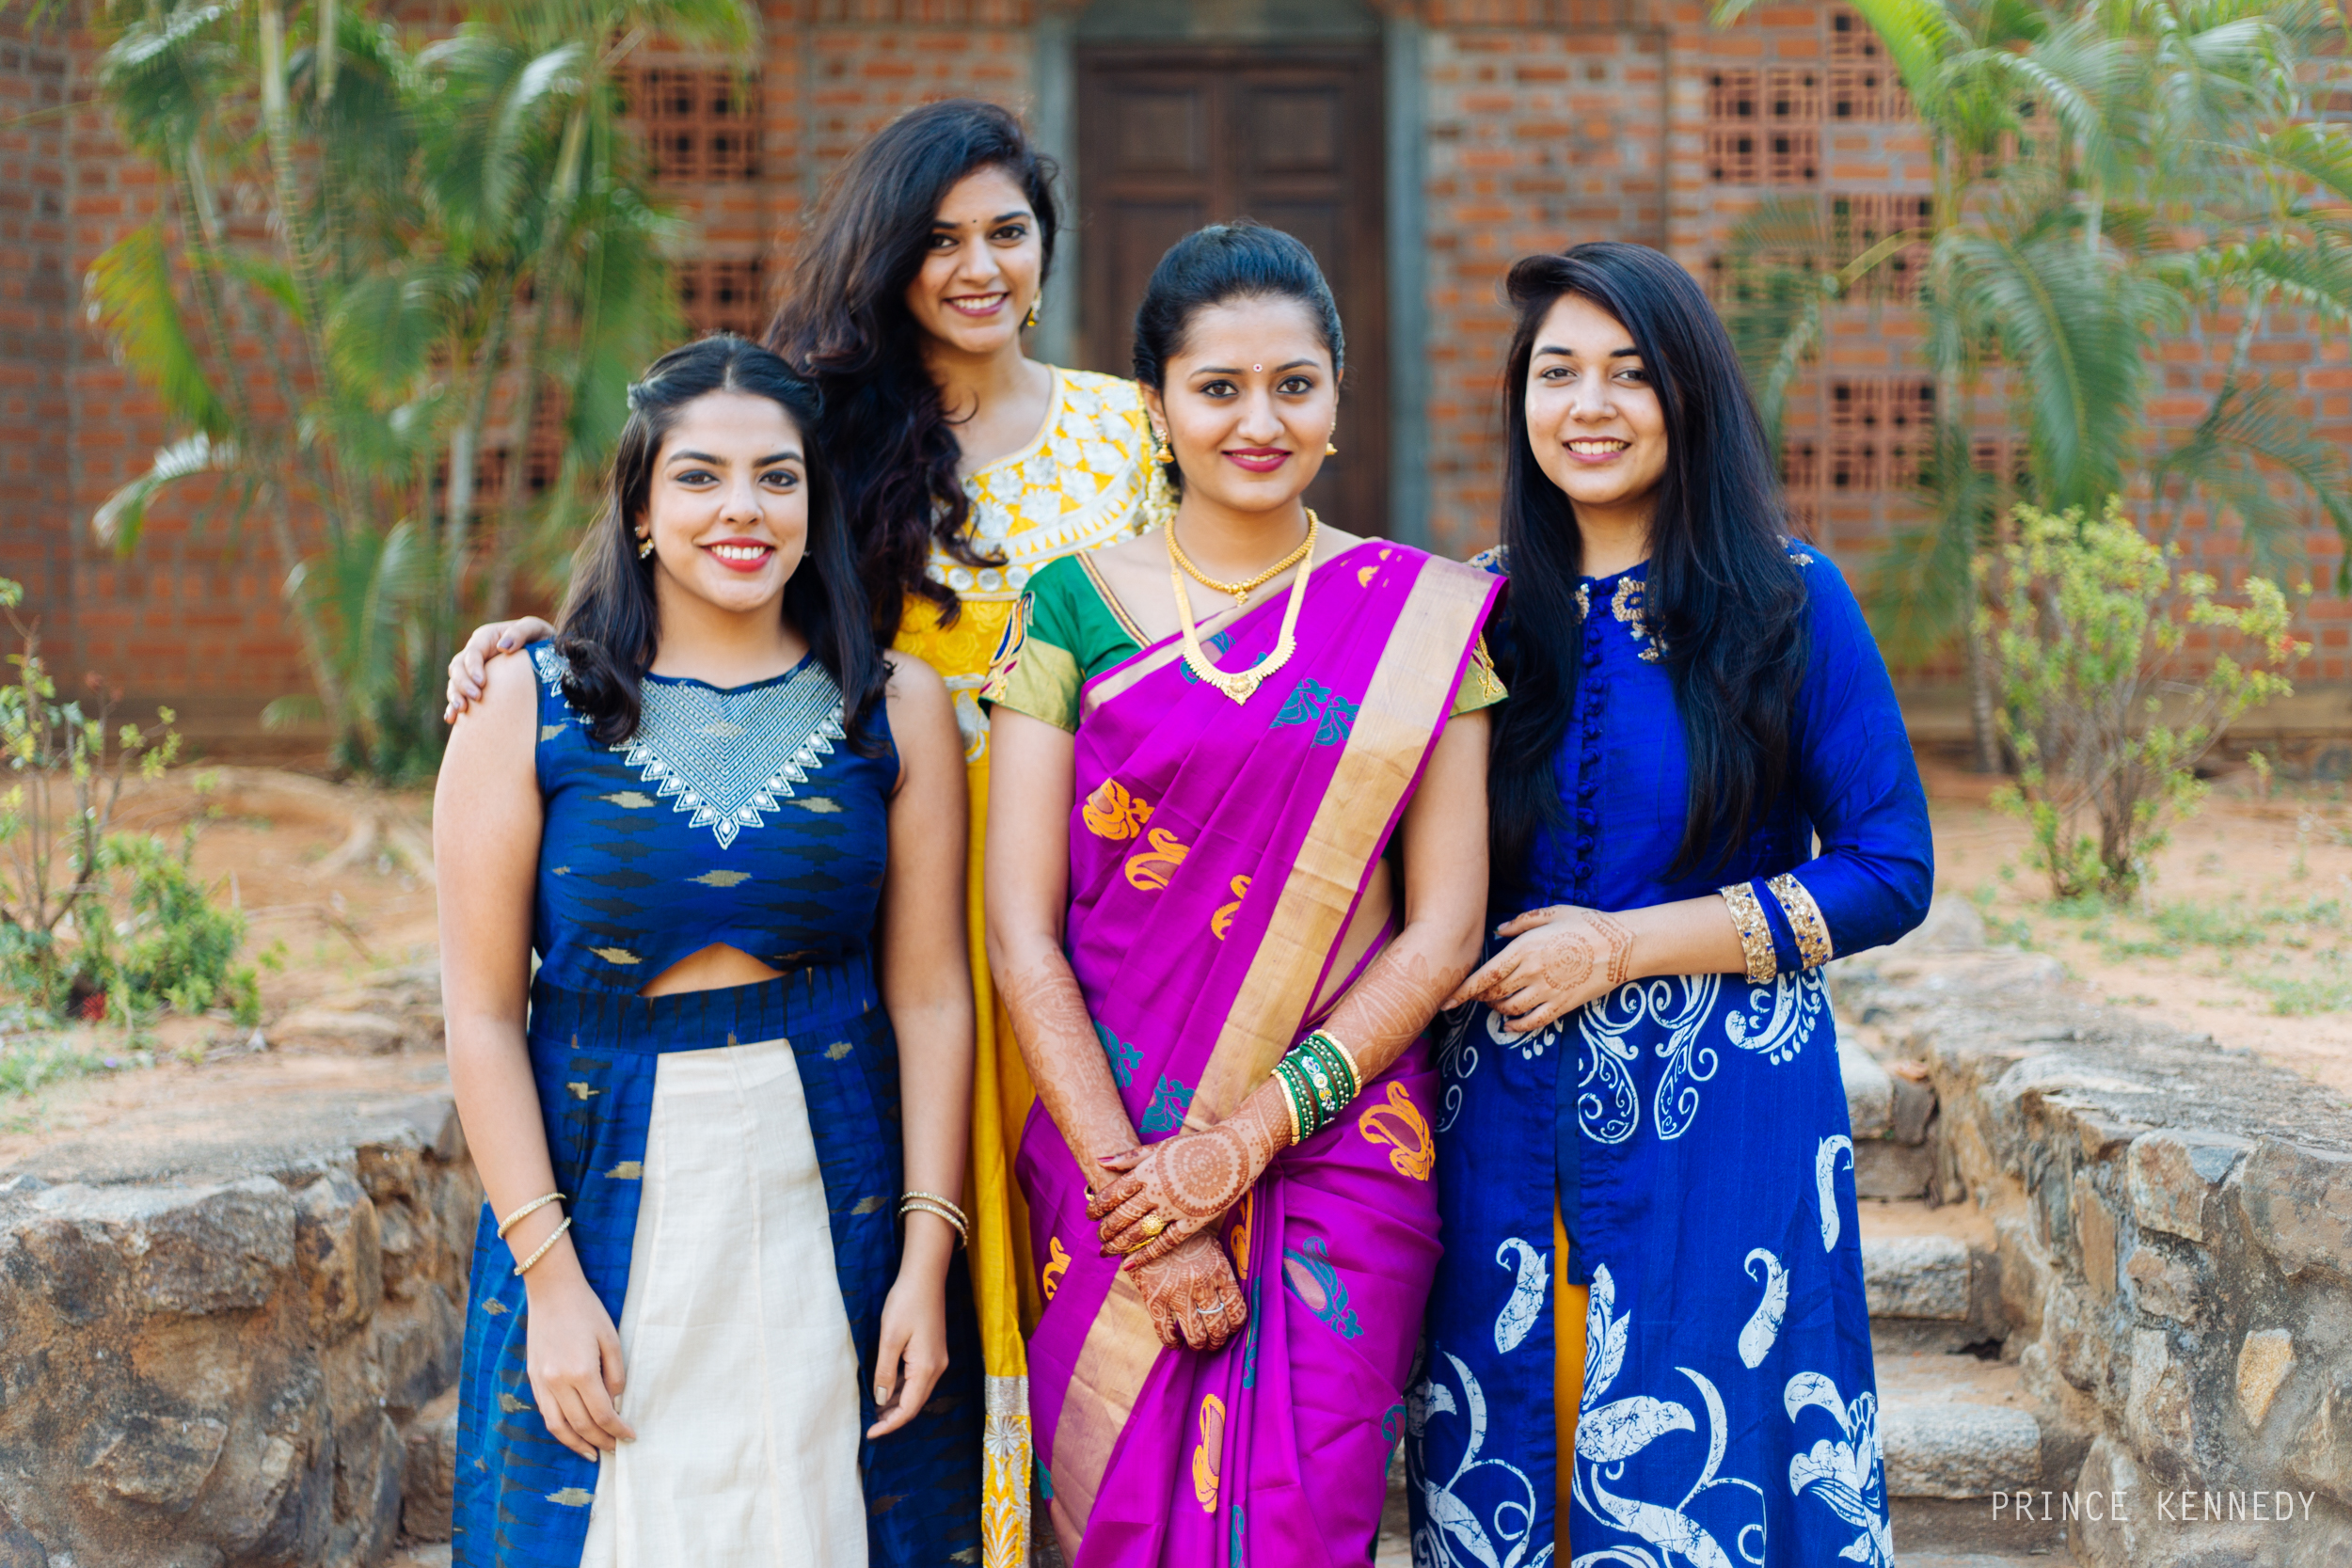 Athmajja-Nithesh-Engagement-Couple-Portrait-Portraiture-Wedding-Couple-Portrait-Chennai-Photographer-Candid-Photography-Destination-Best-Prince-Kennedy-Photography-13.jpg